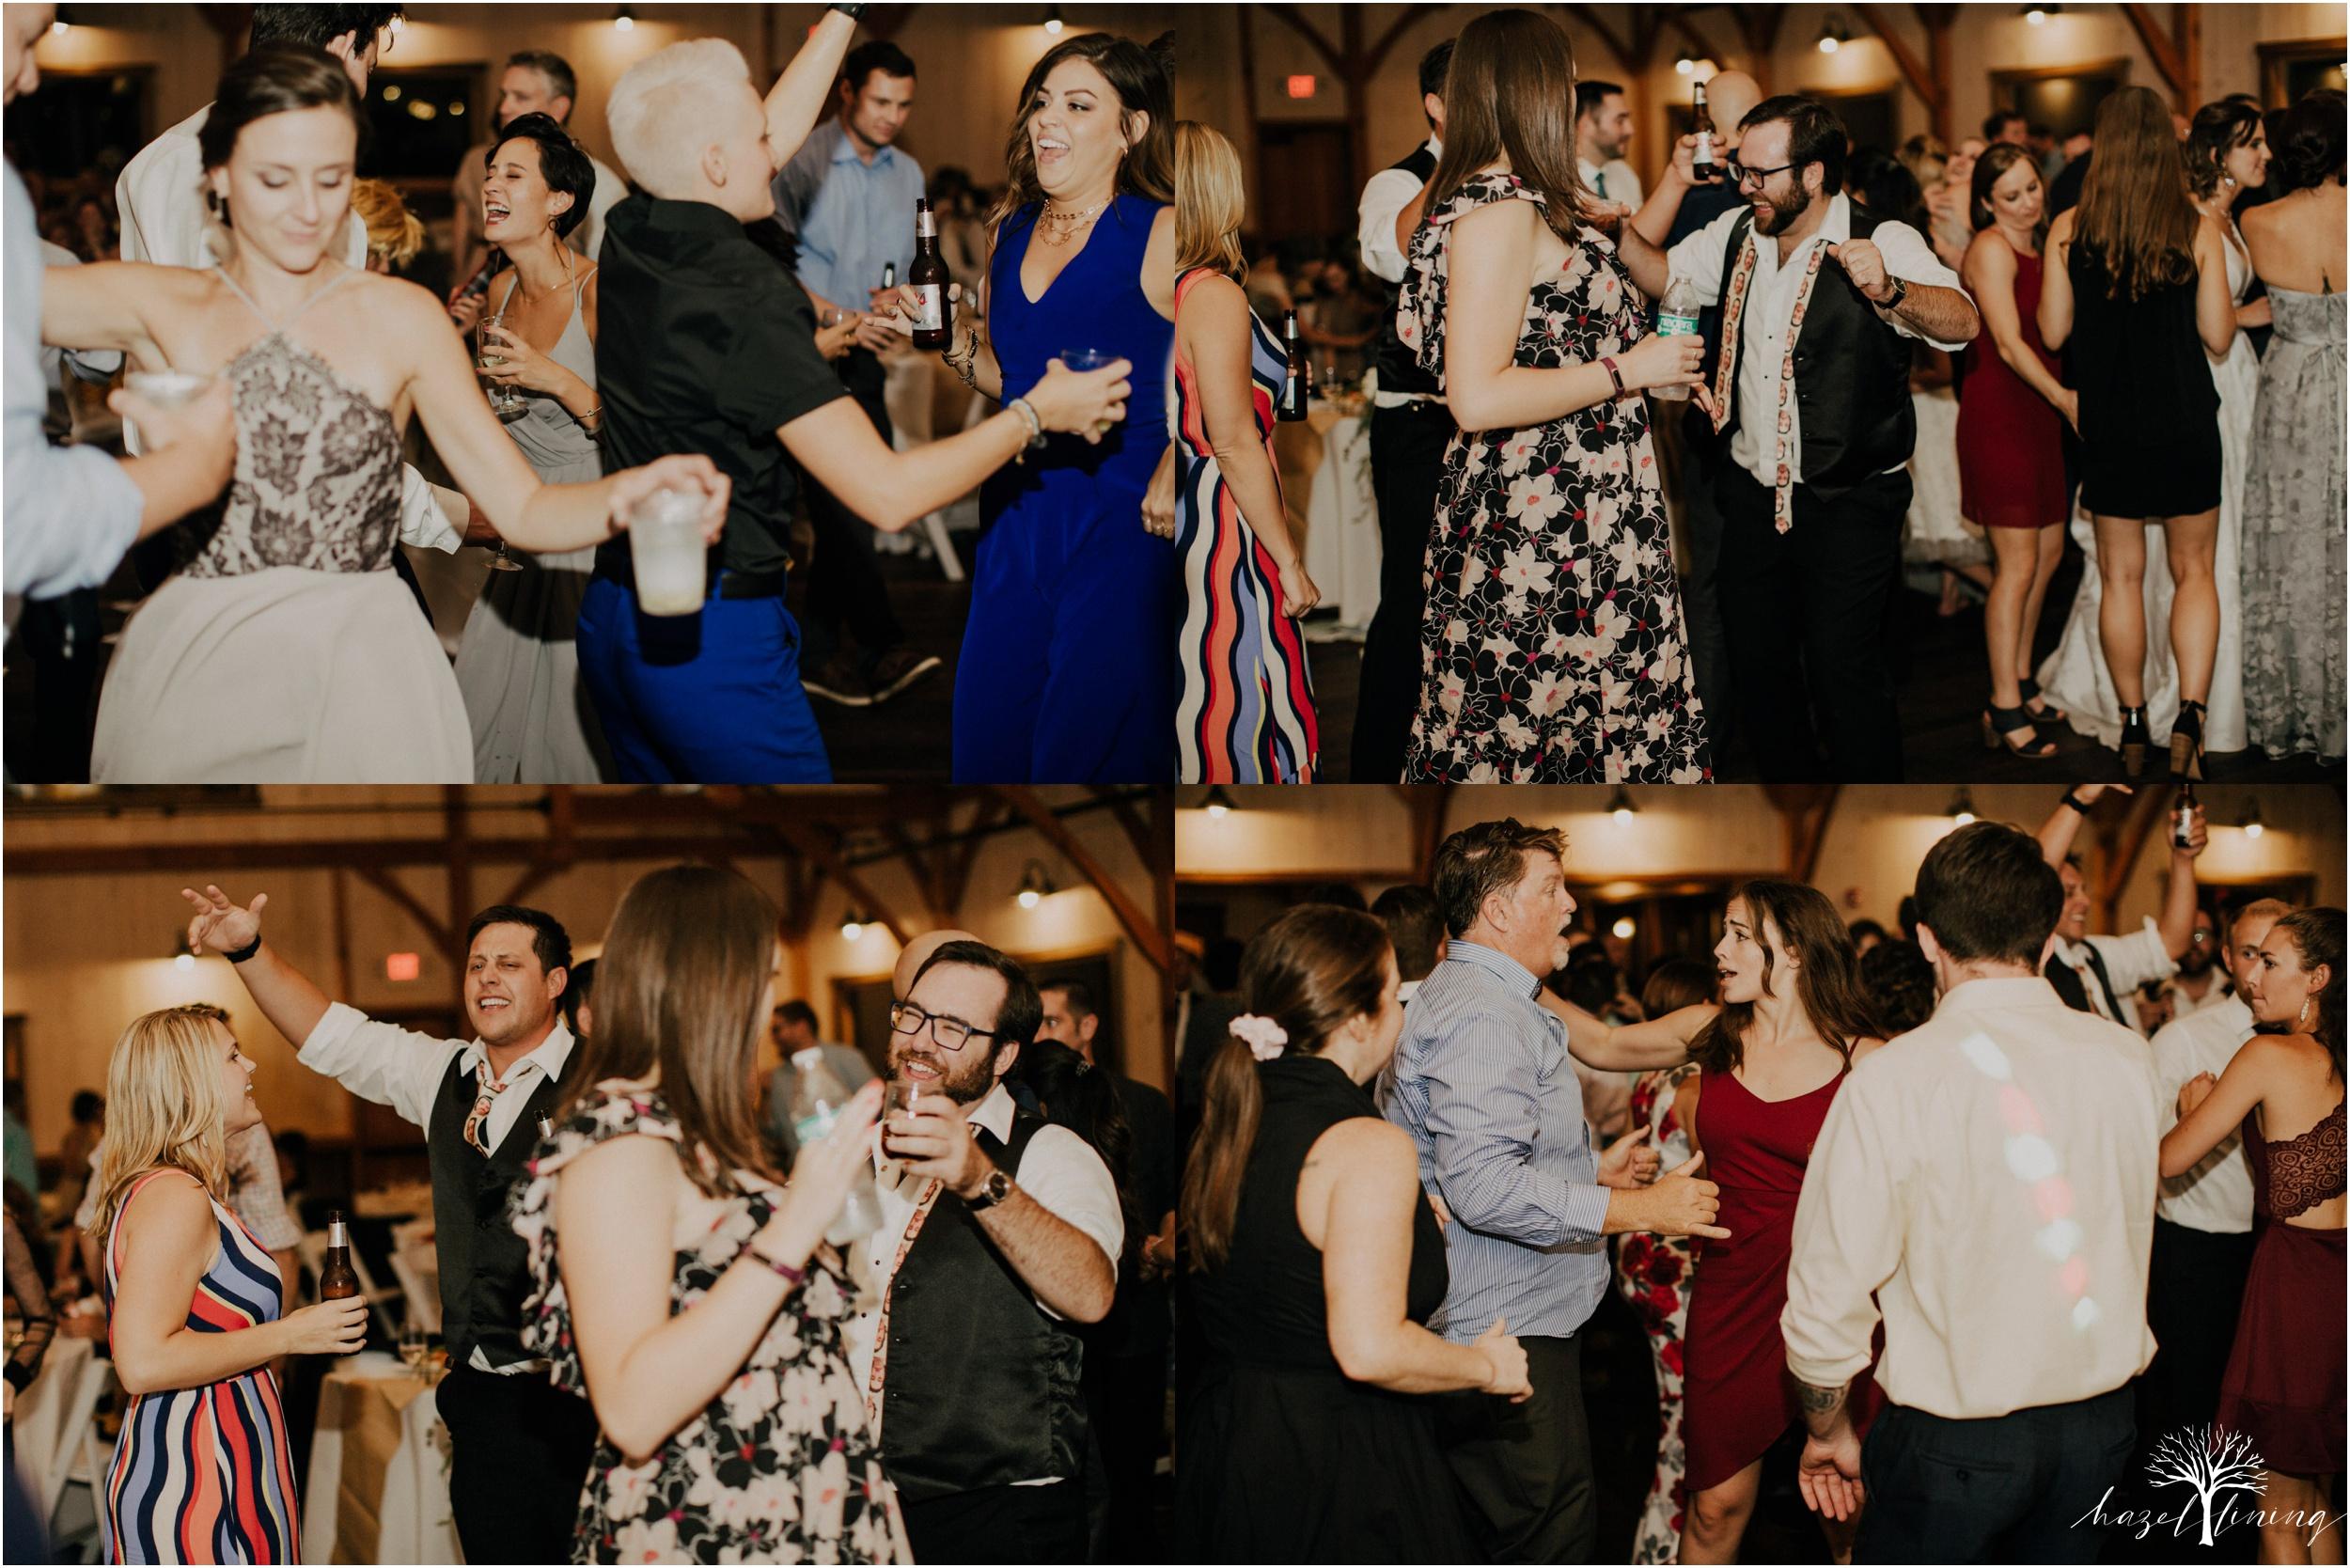 maureen-hepner-anthony-giordano-rose-bank-winery-newtow-pennsylvania-luxury-summer-wedding-hazel-lining-photography-destination-elopement-wedding-engagement-photography_0154.jpg